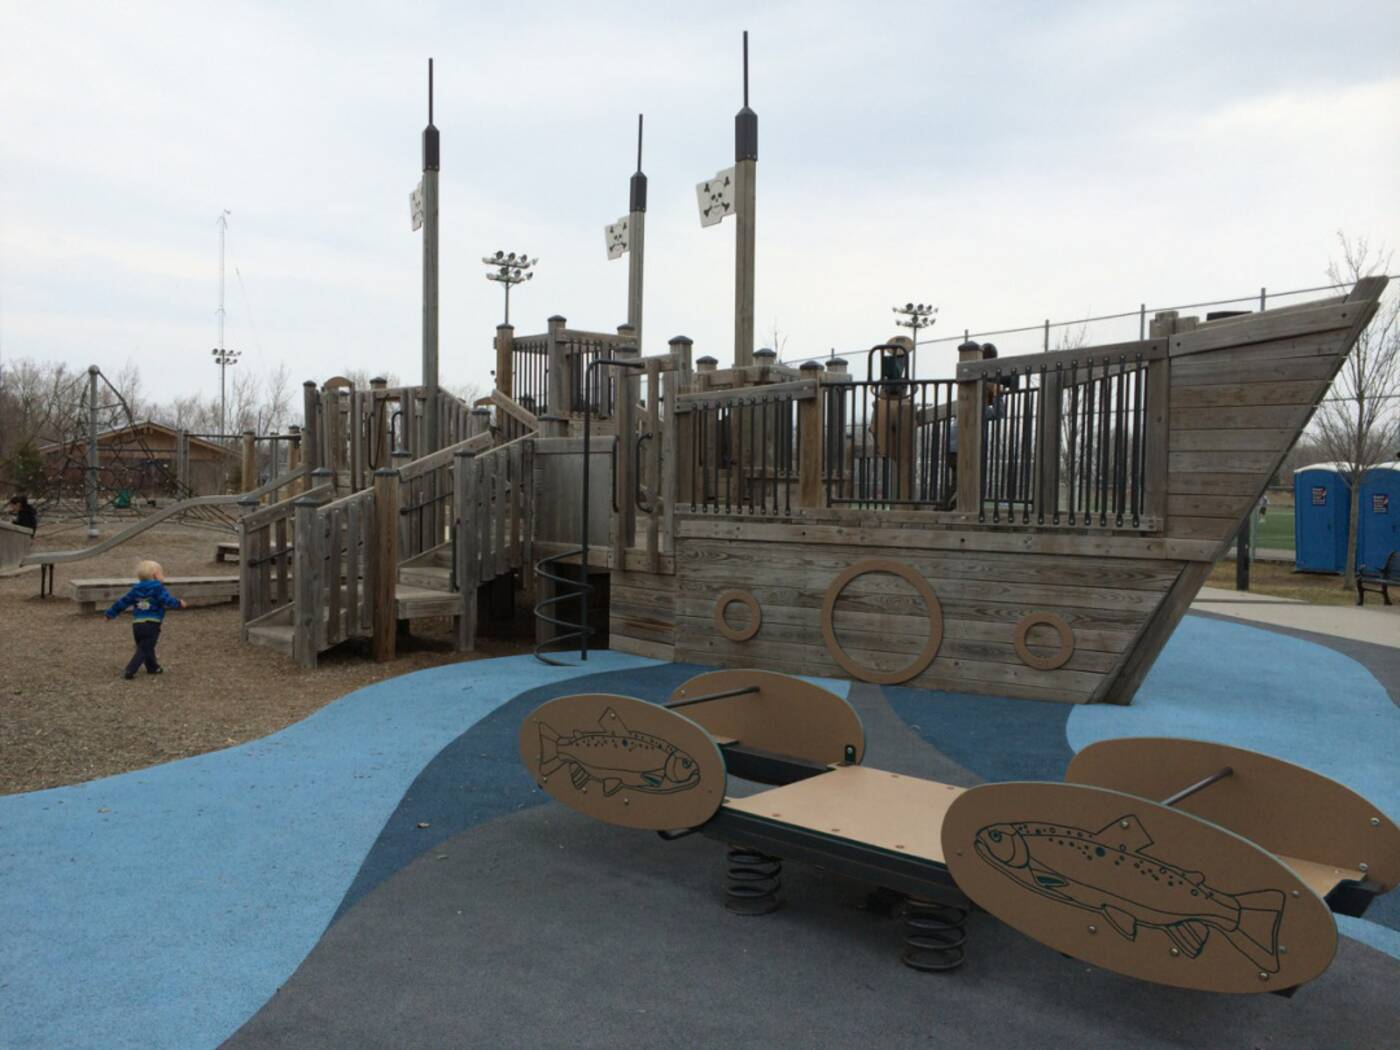 best playgrounds toronto